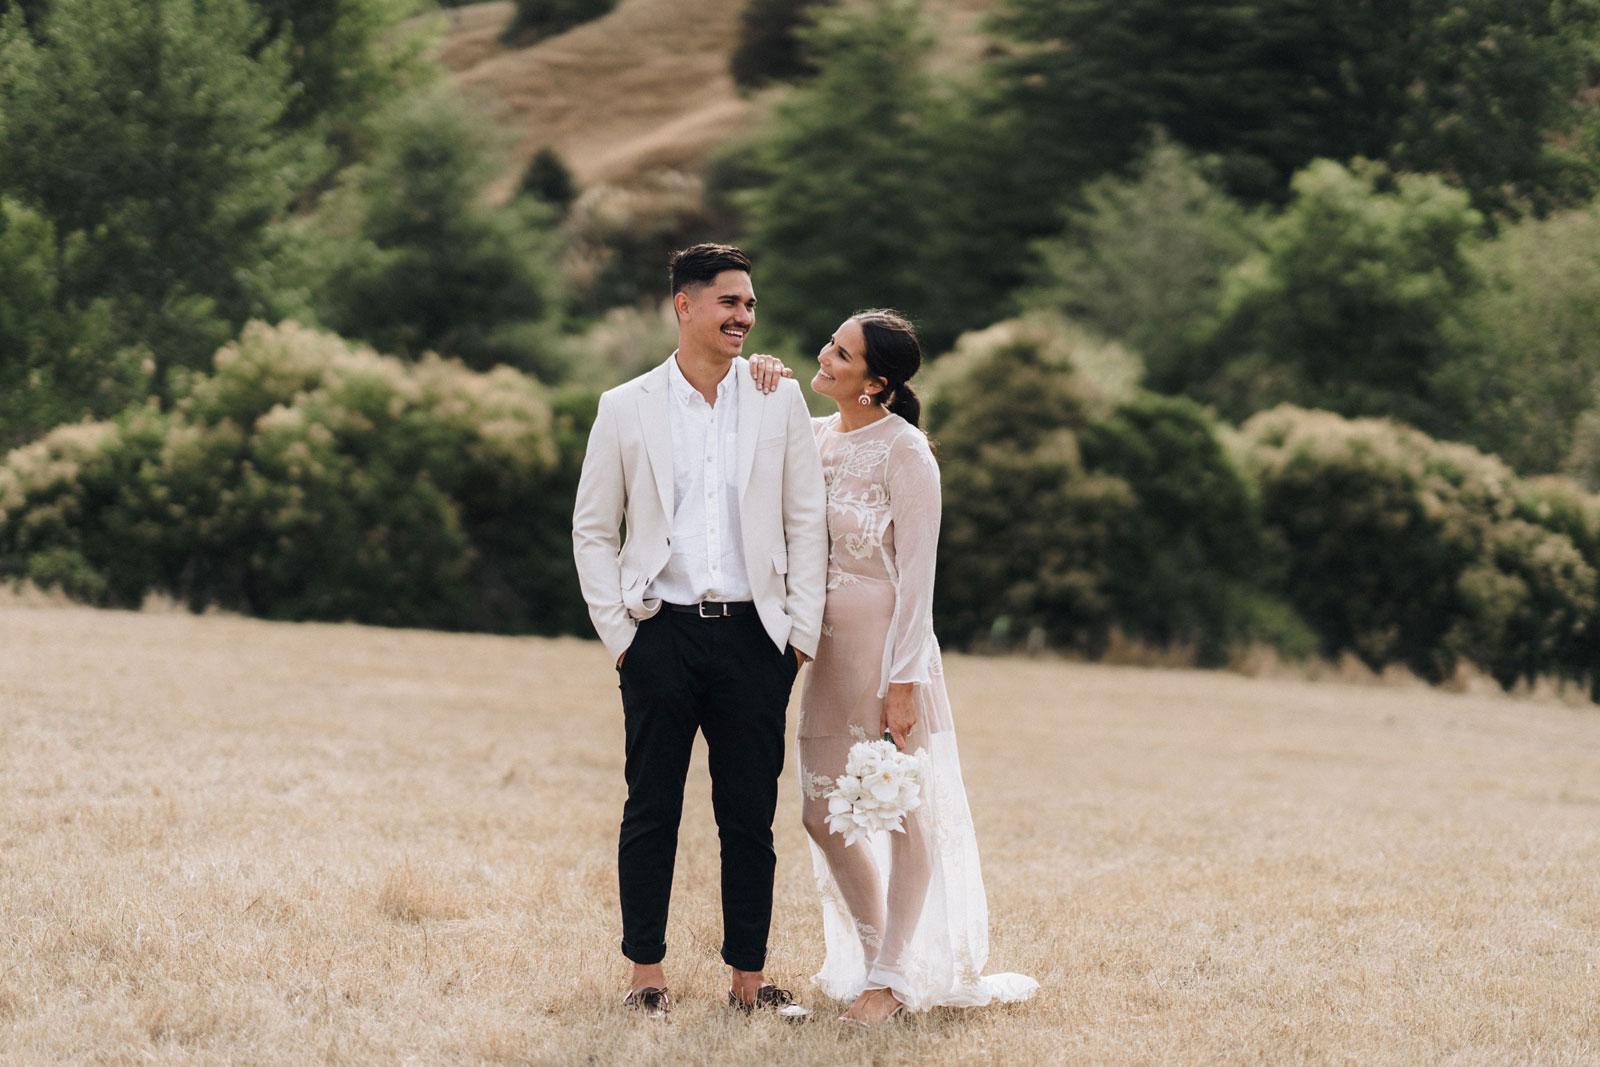 newfound-s-t-hunua-auckland-wedding-photographers-067